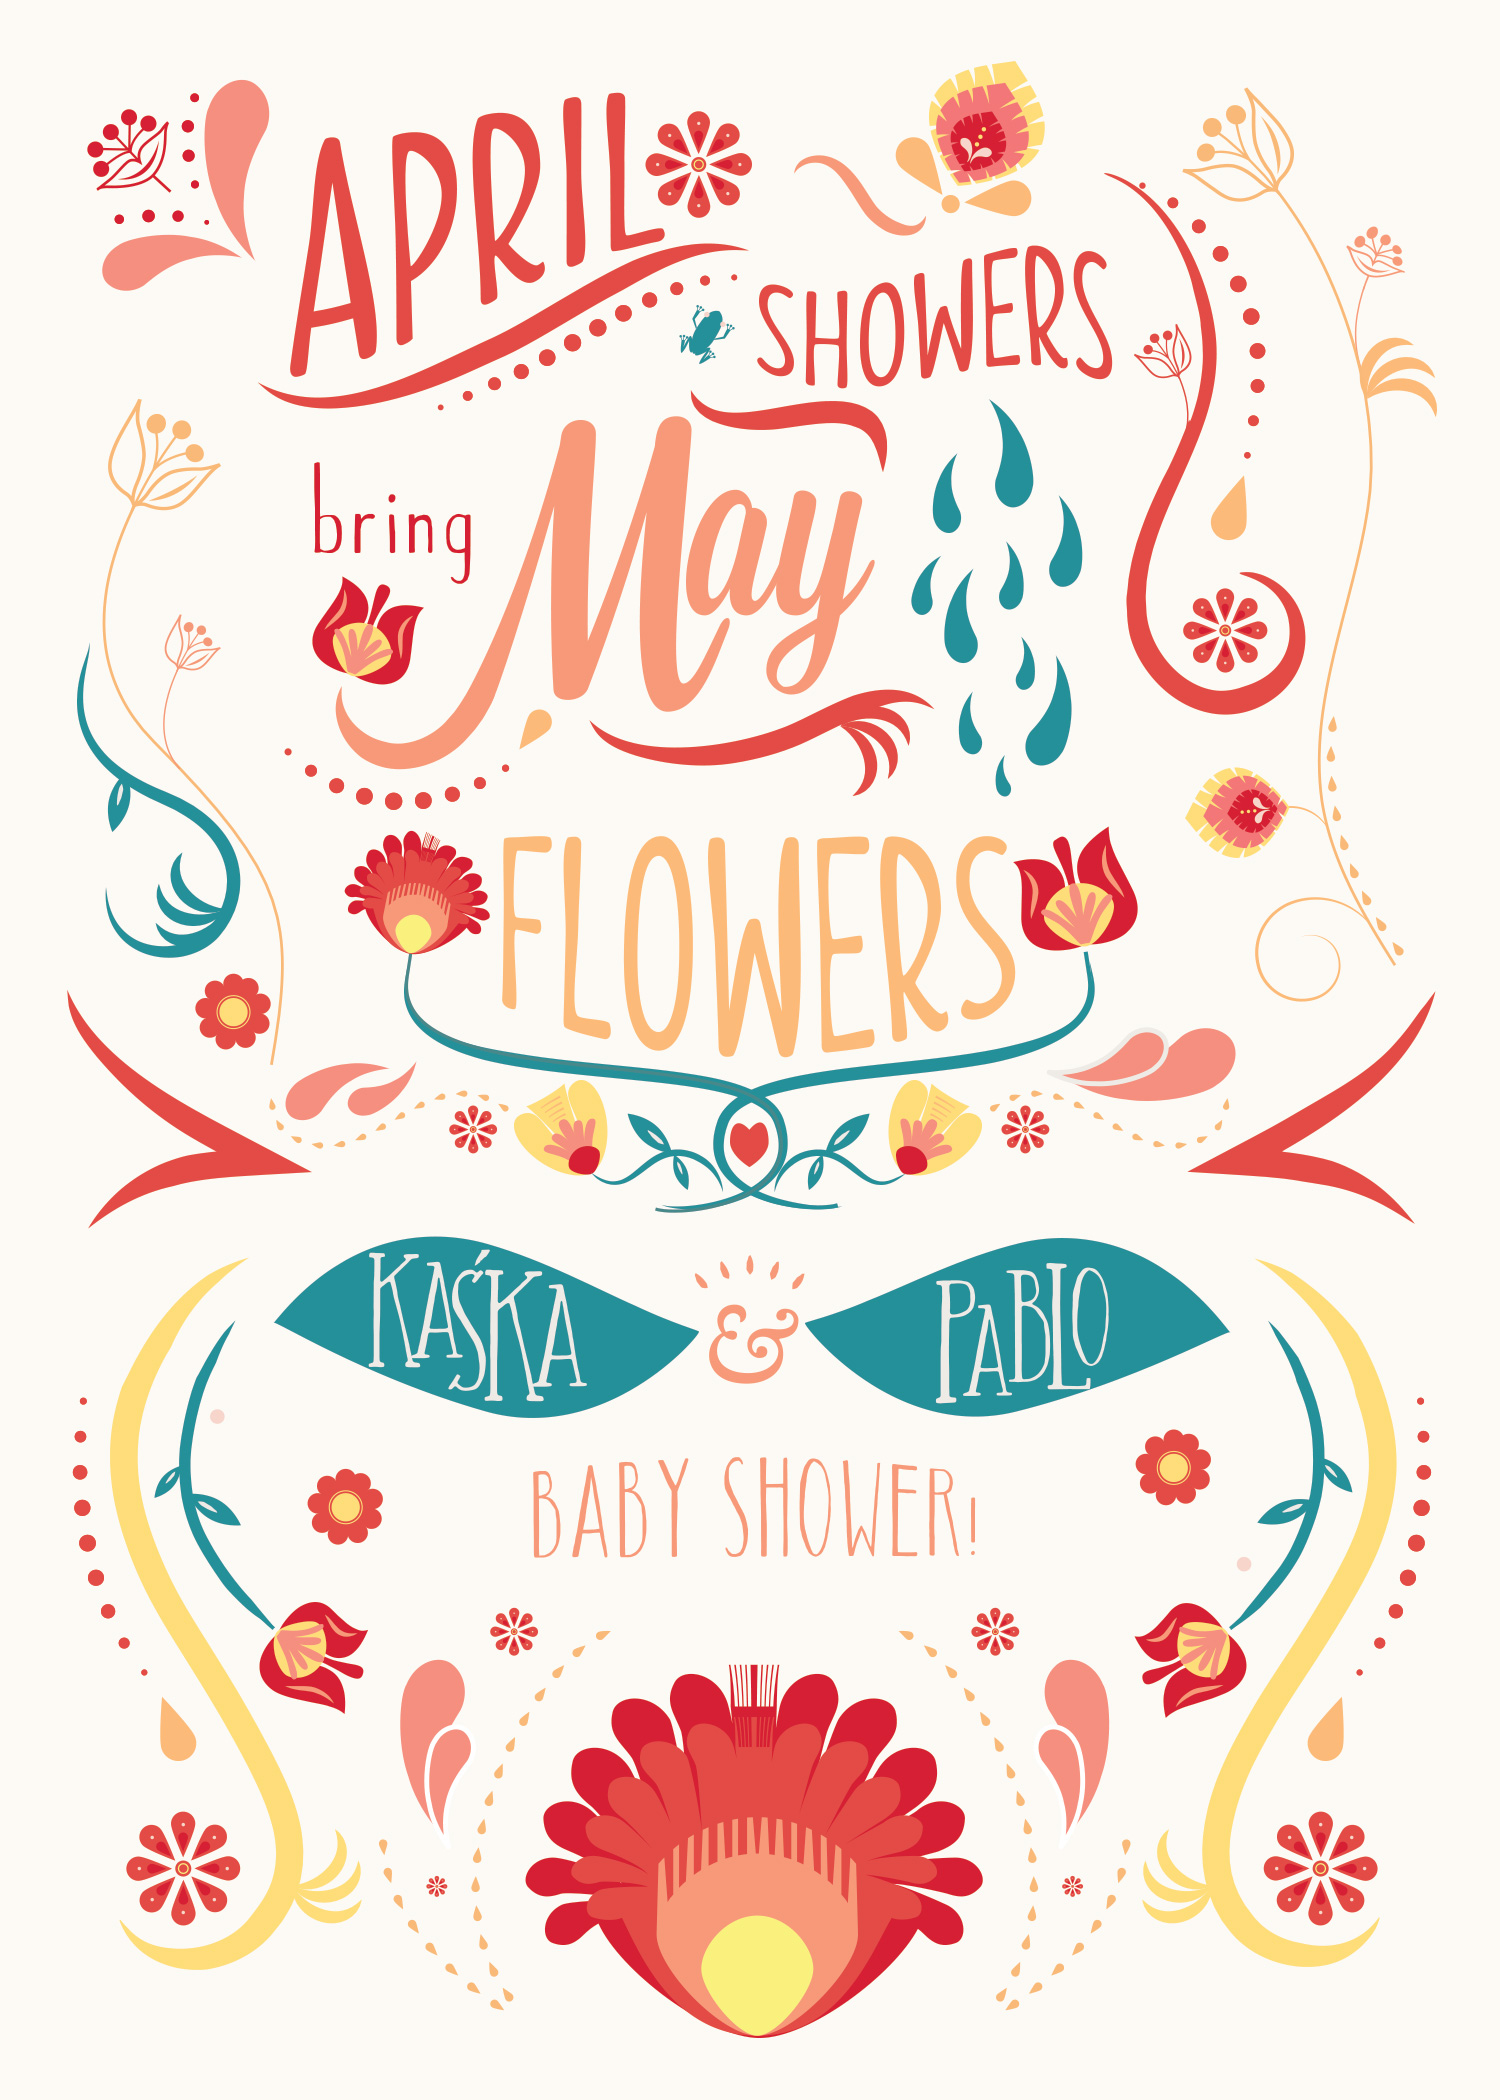 April Showers Bring May Flowers  liannierioscom